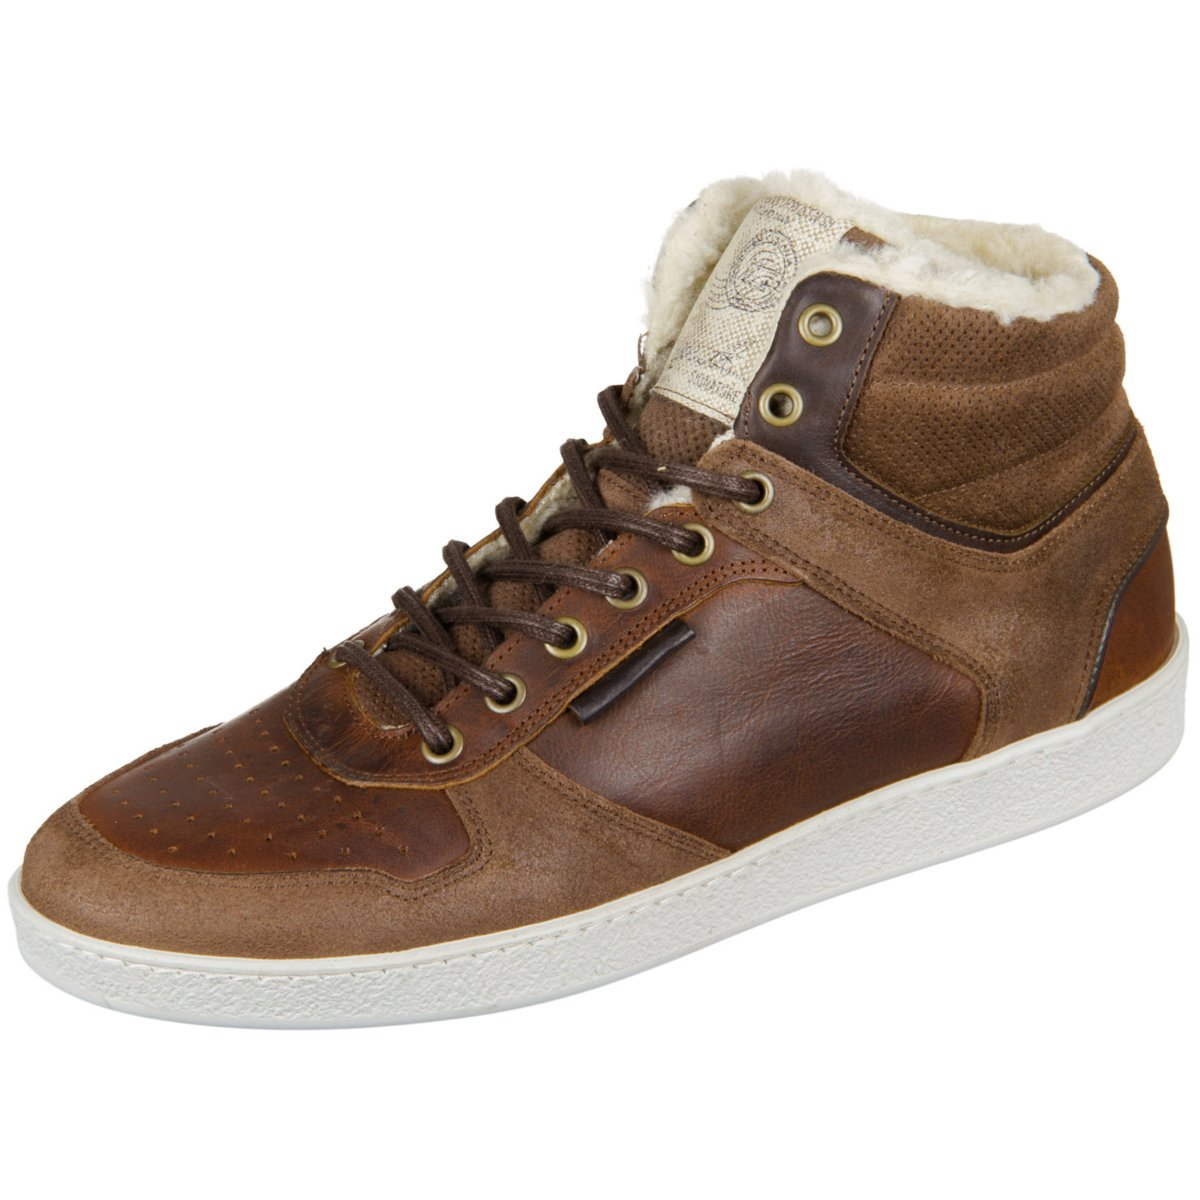 NEU Bullboxer Herren Sneaker 735K55143DMBRN braun 368278